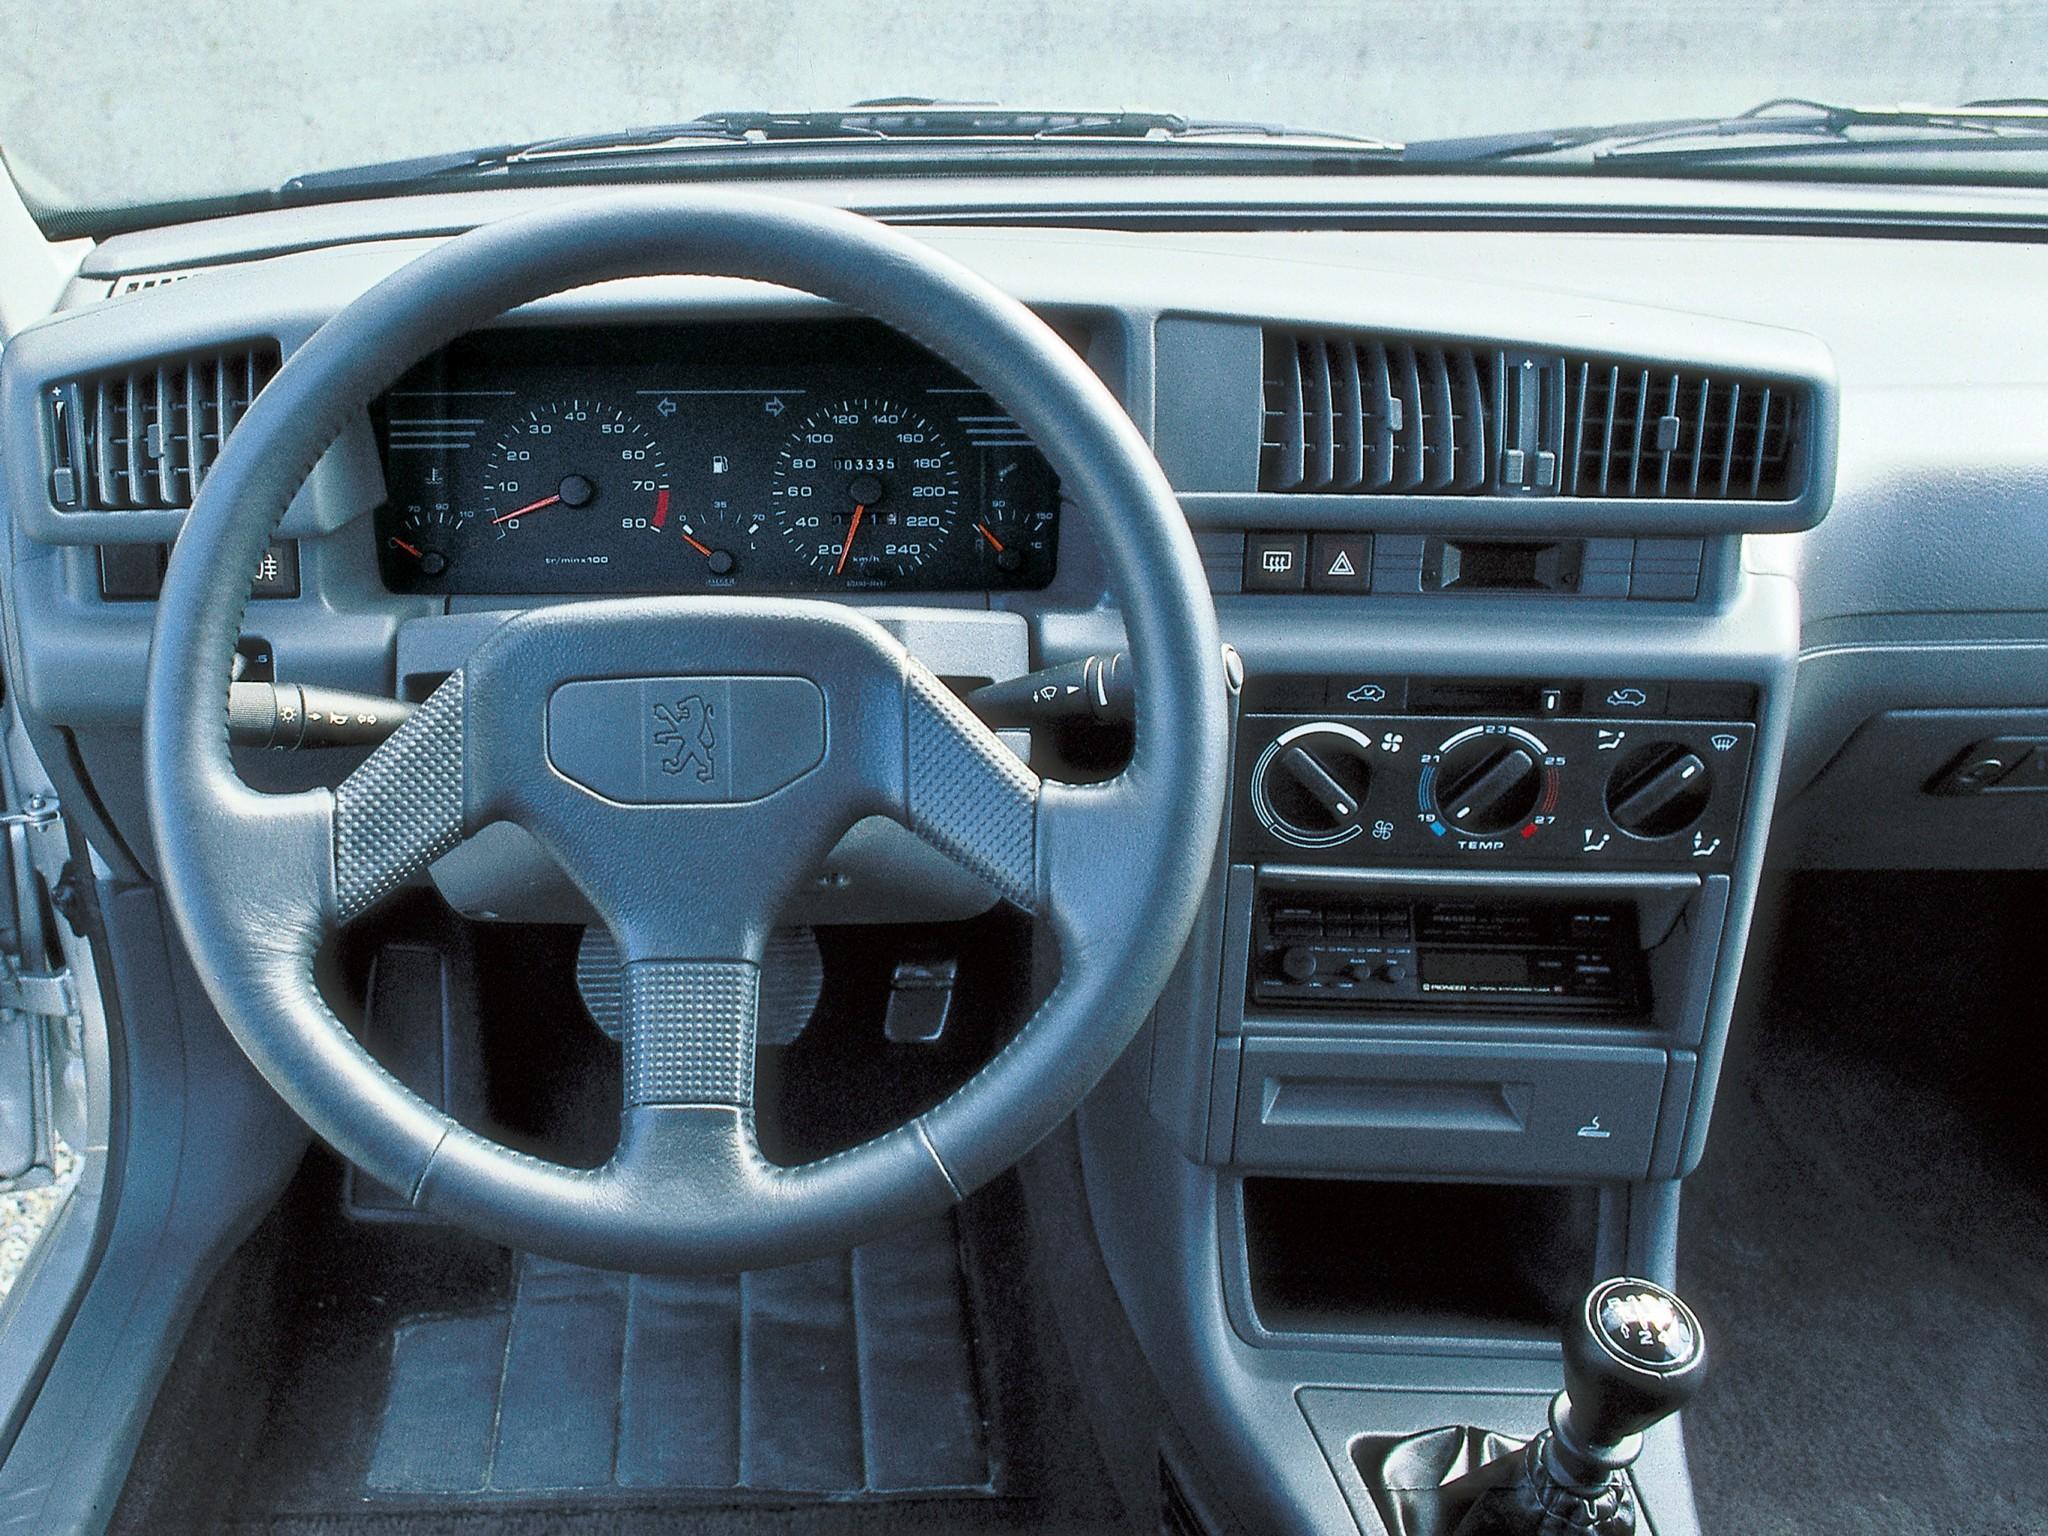 Porsche 928 interior porsche 928 interior 1 - Peugeot 405 1987 1988 1989 1990 1991 1992 1993